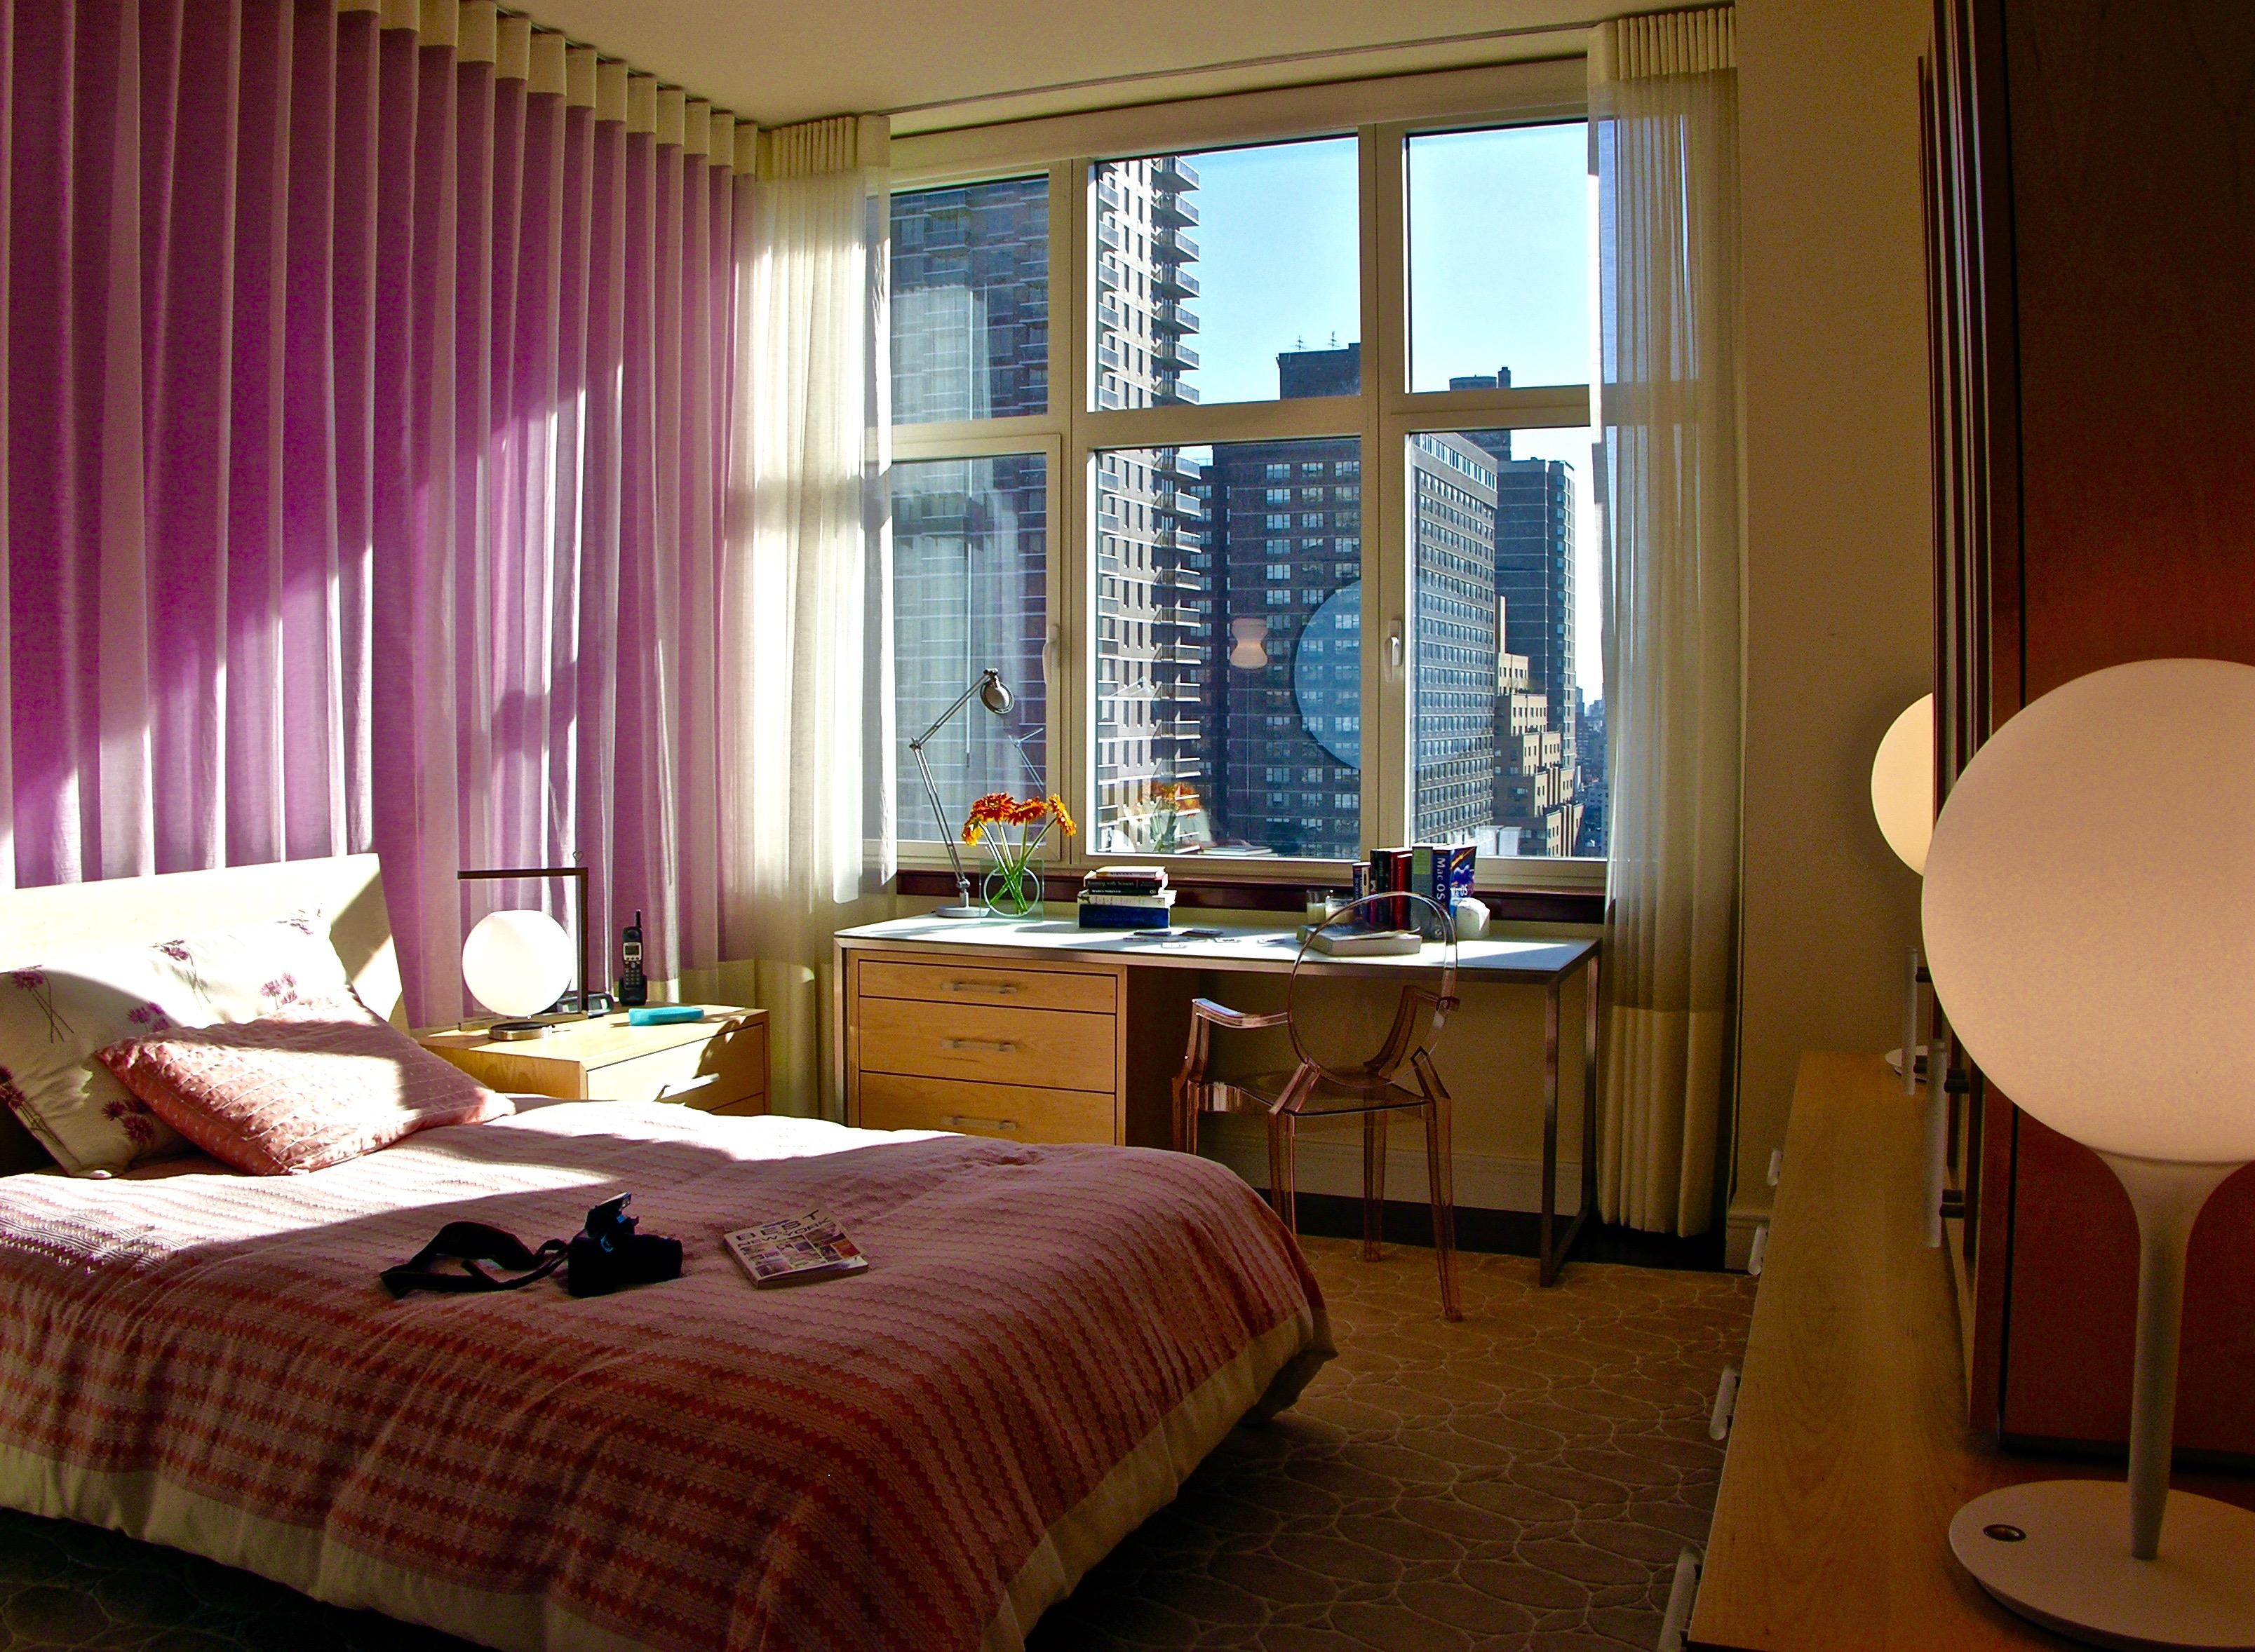 danielles-room